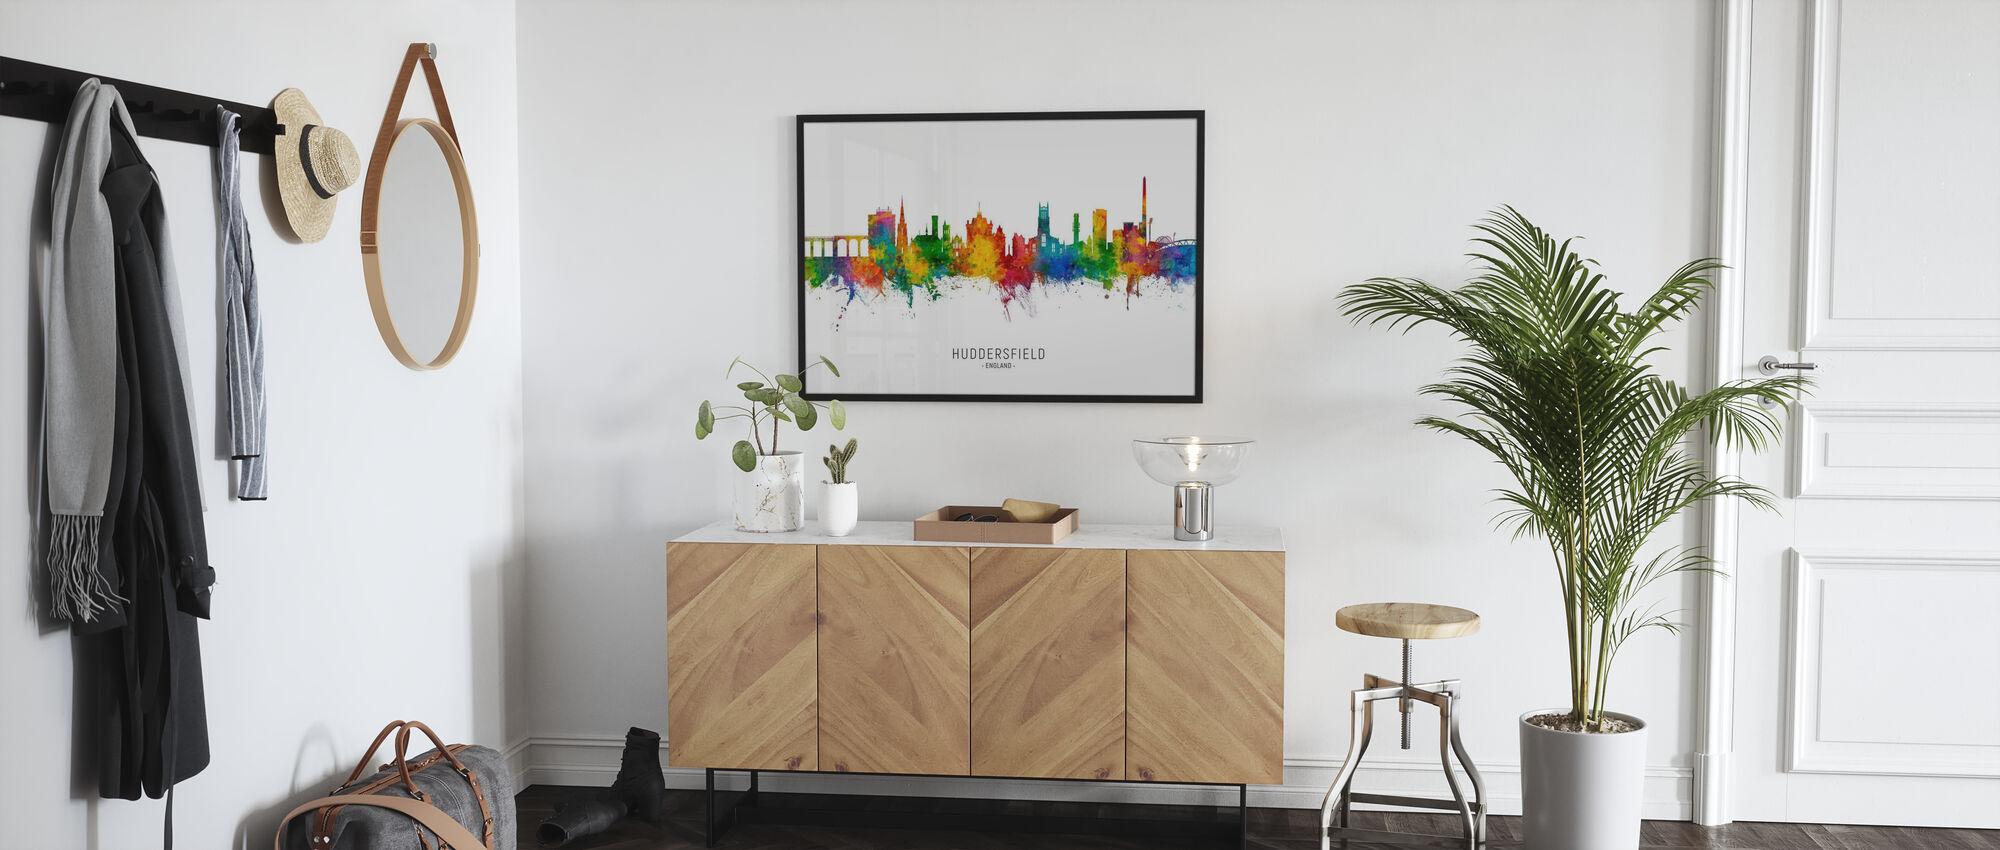 Huddersfield England Skyline - Poster - Hallway